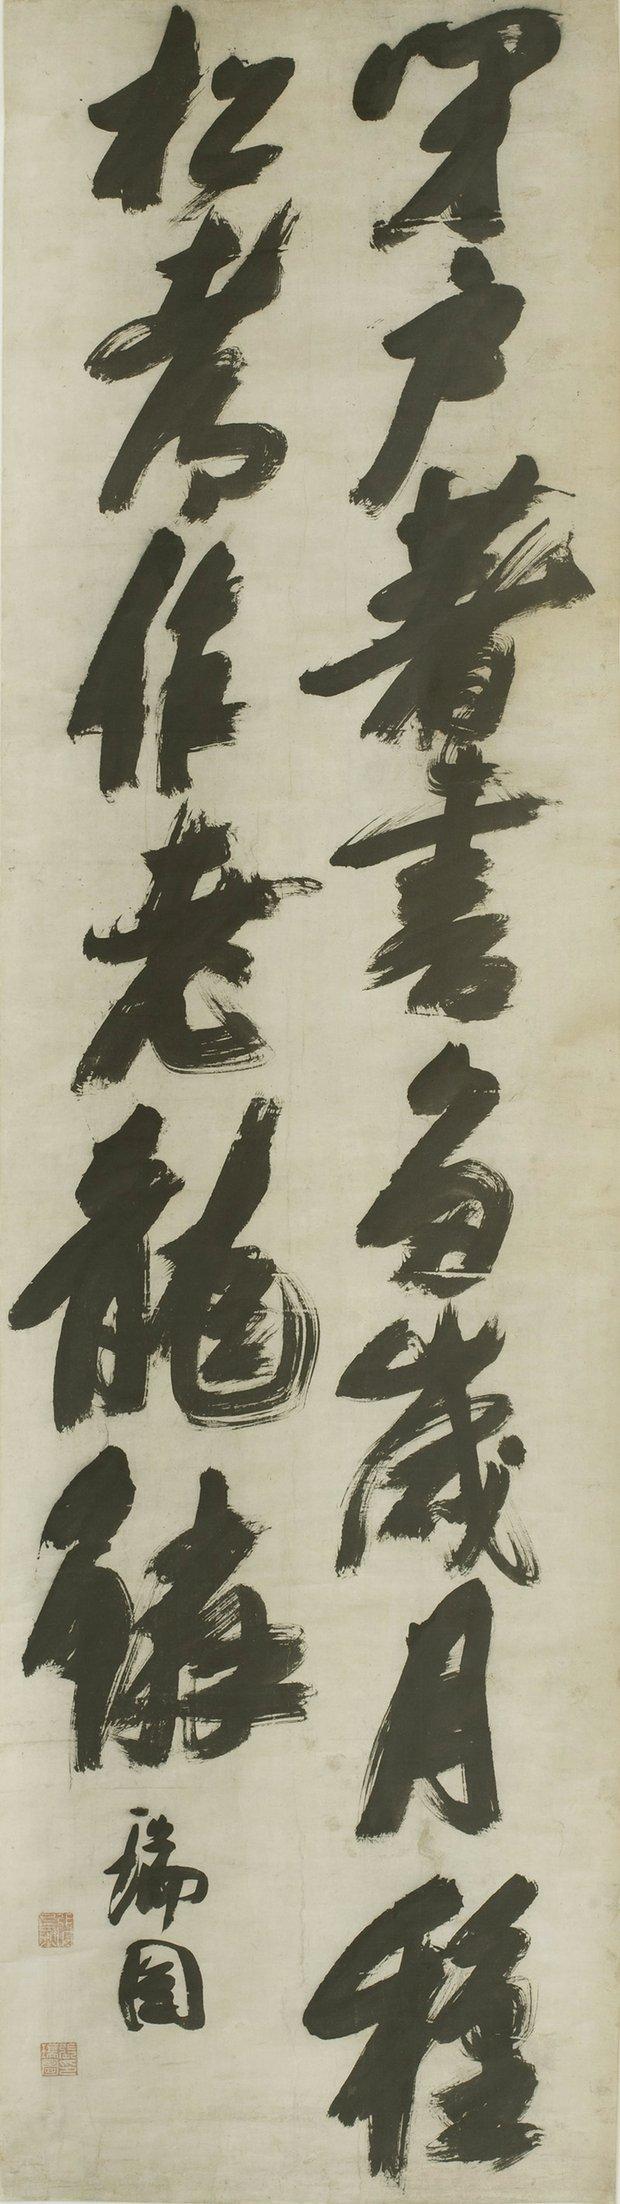 Cat 15 Poem by Wang Wei